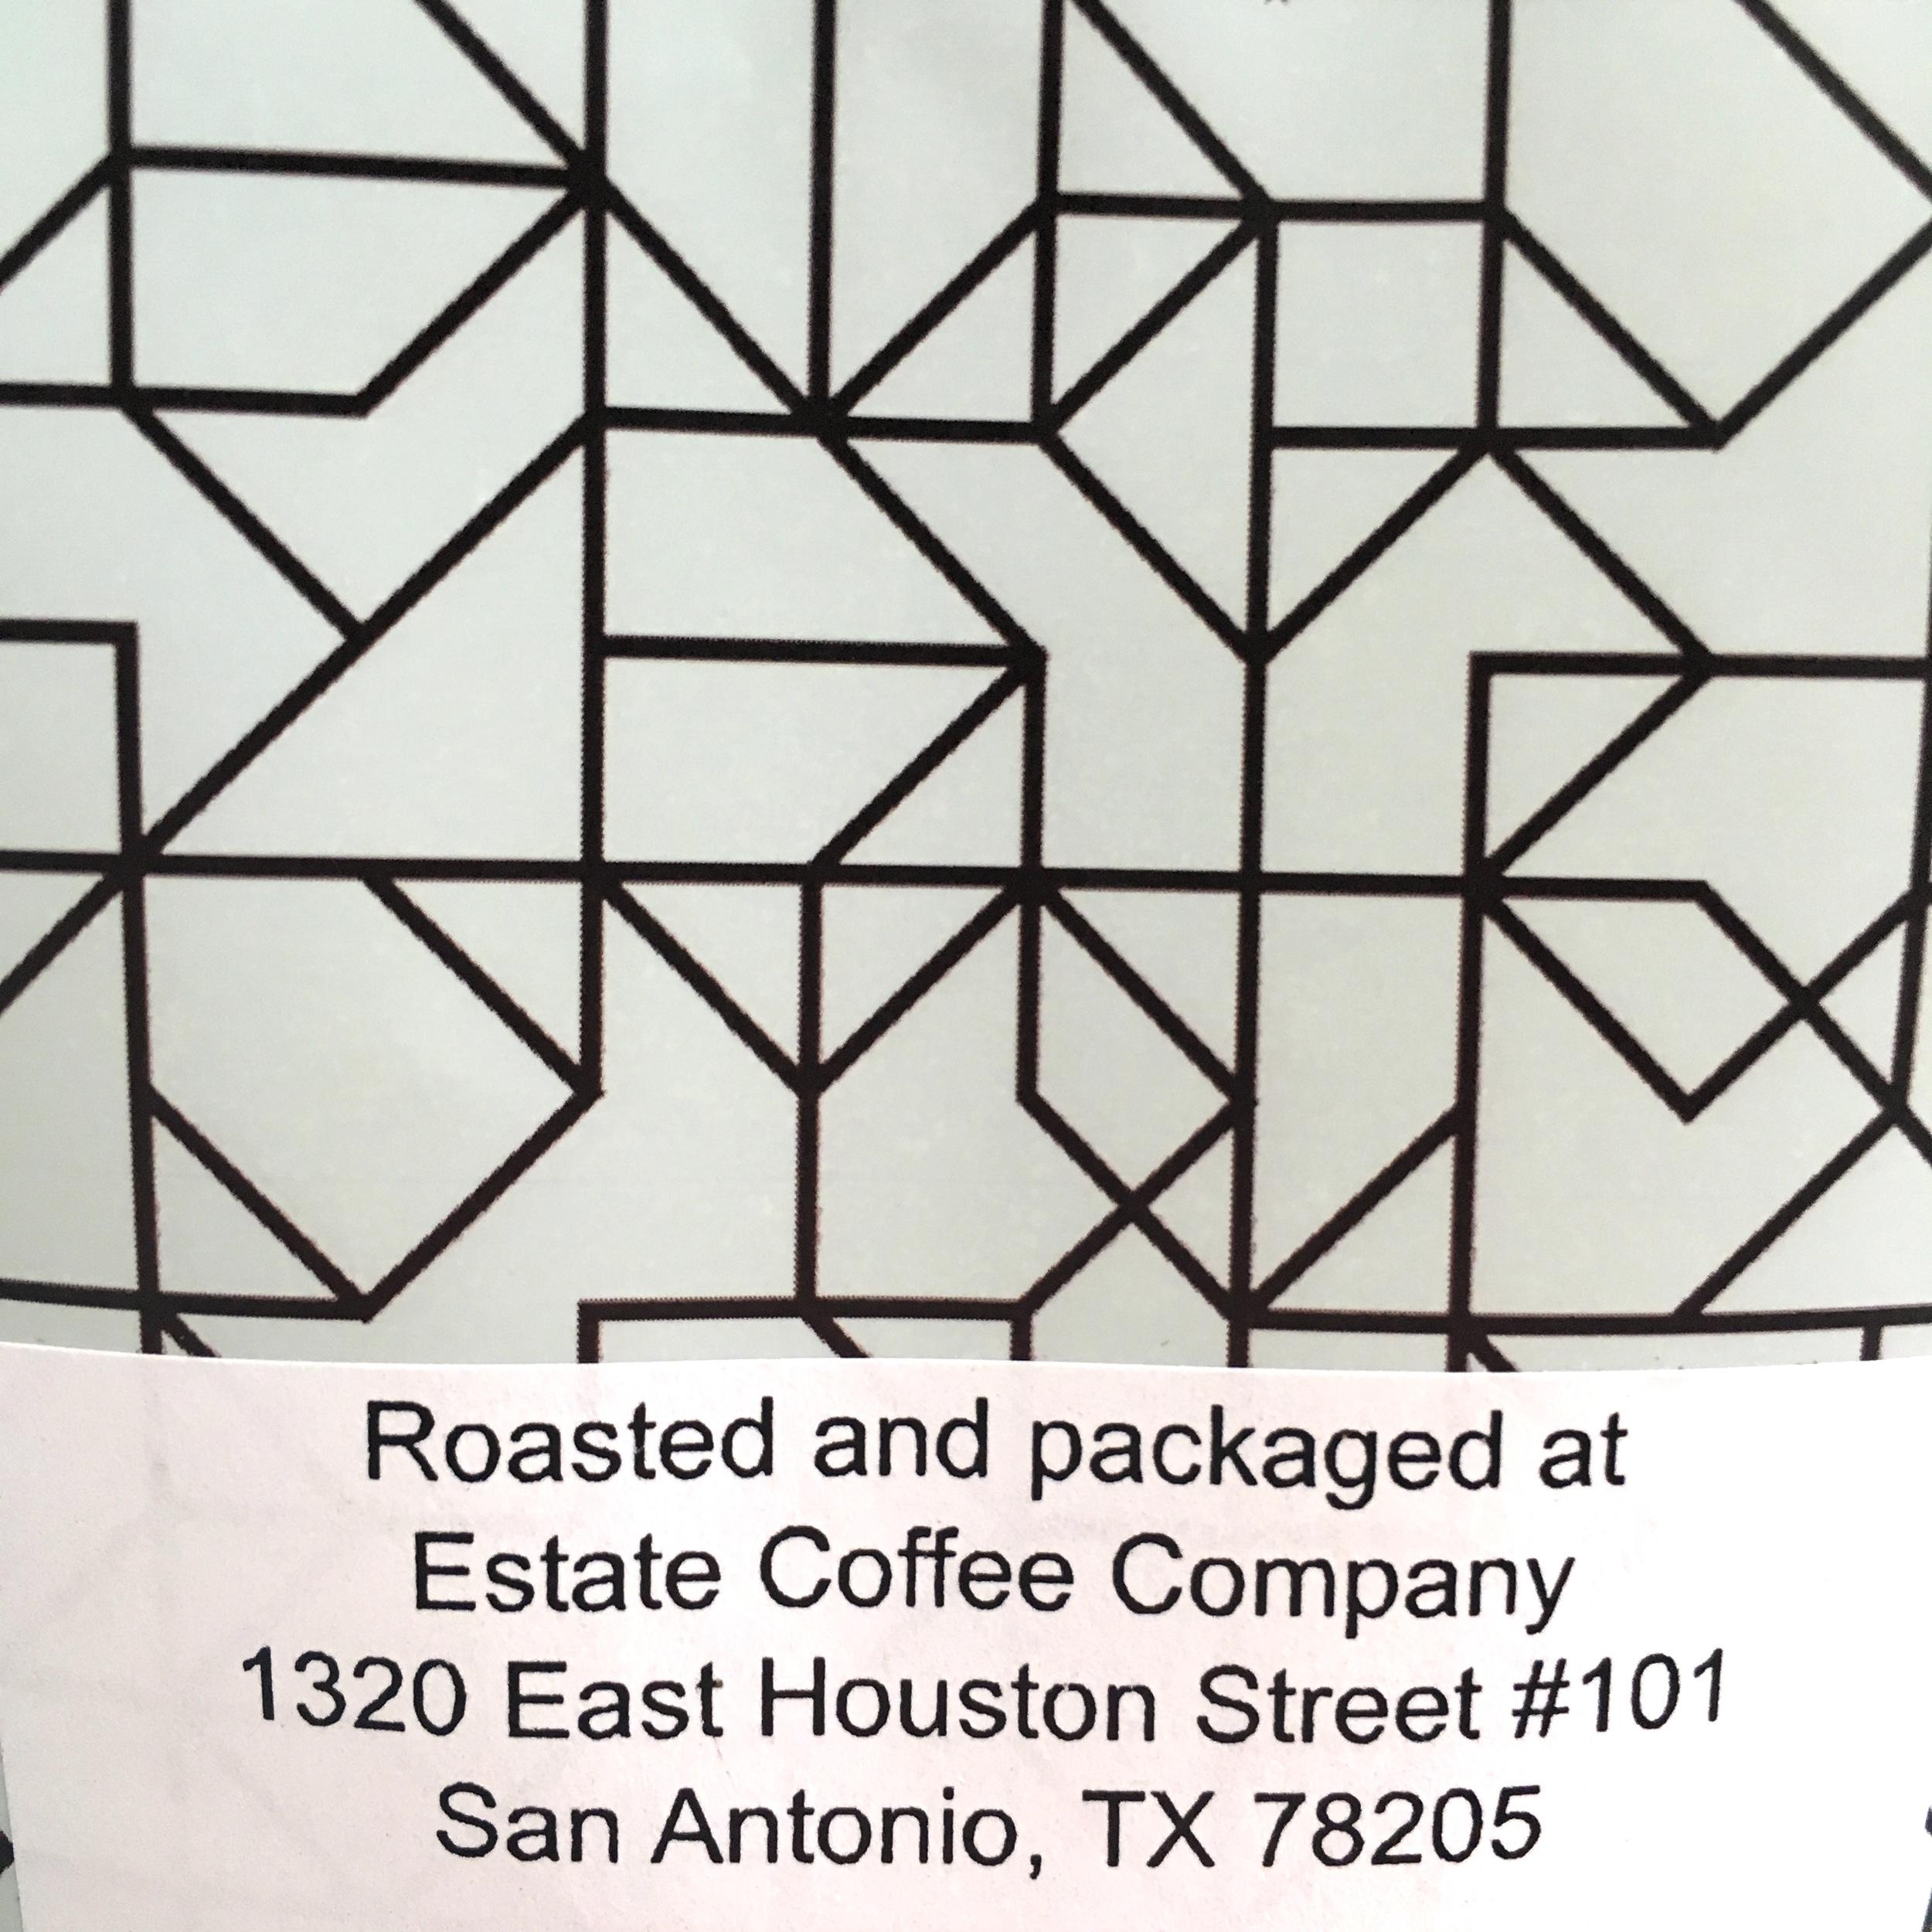 Estate Coffee Co. Information